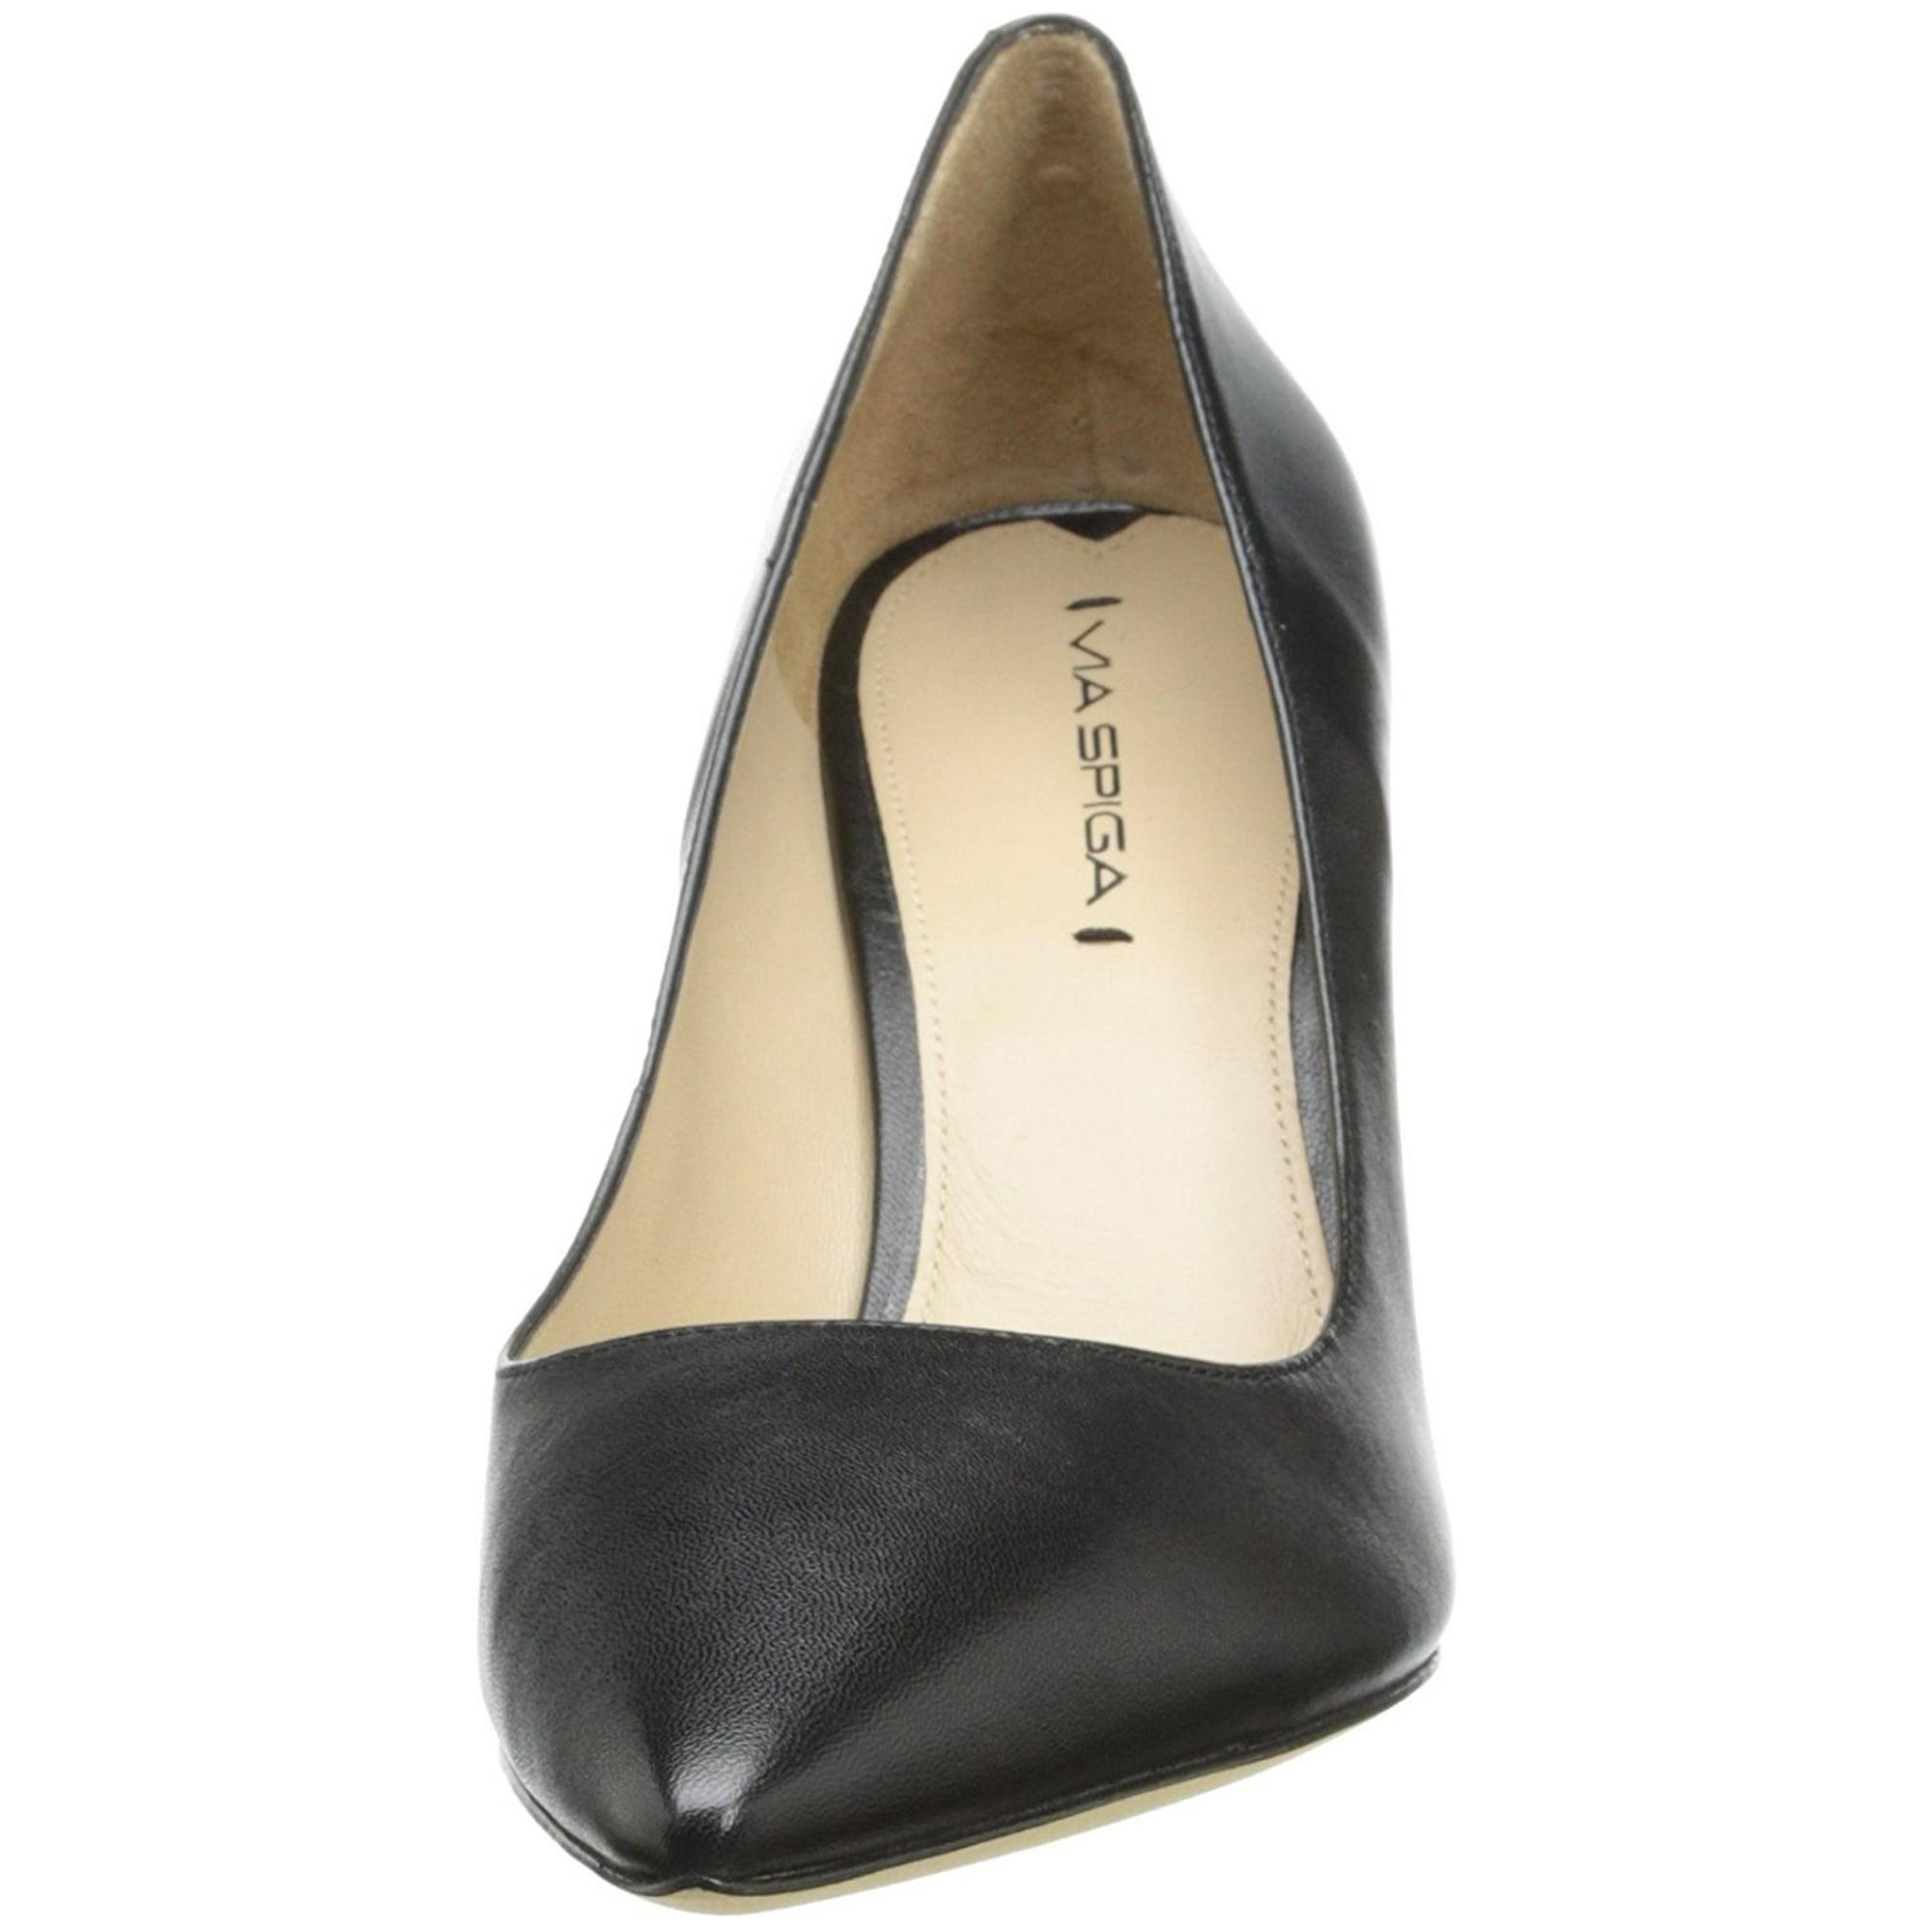 a76b0d193002 Via Spiga Womens Carola Leather Pointed Toe Classic Pumps